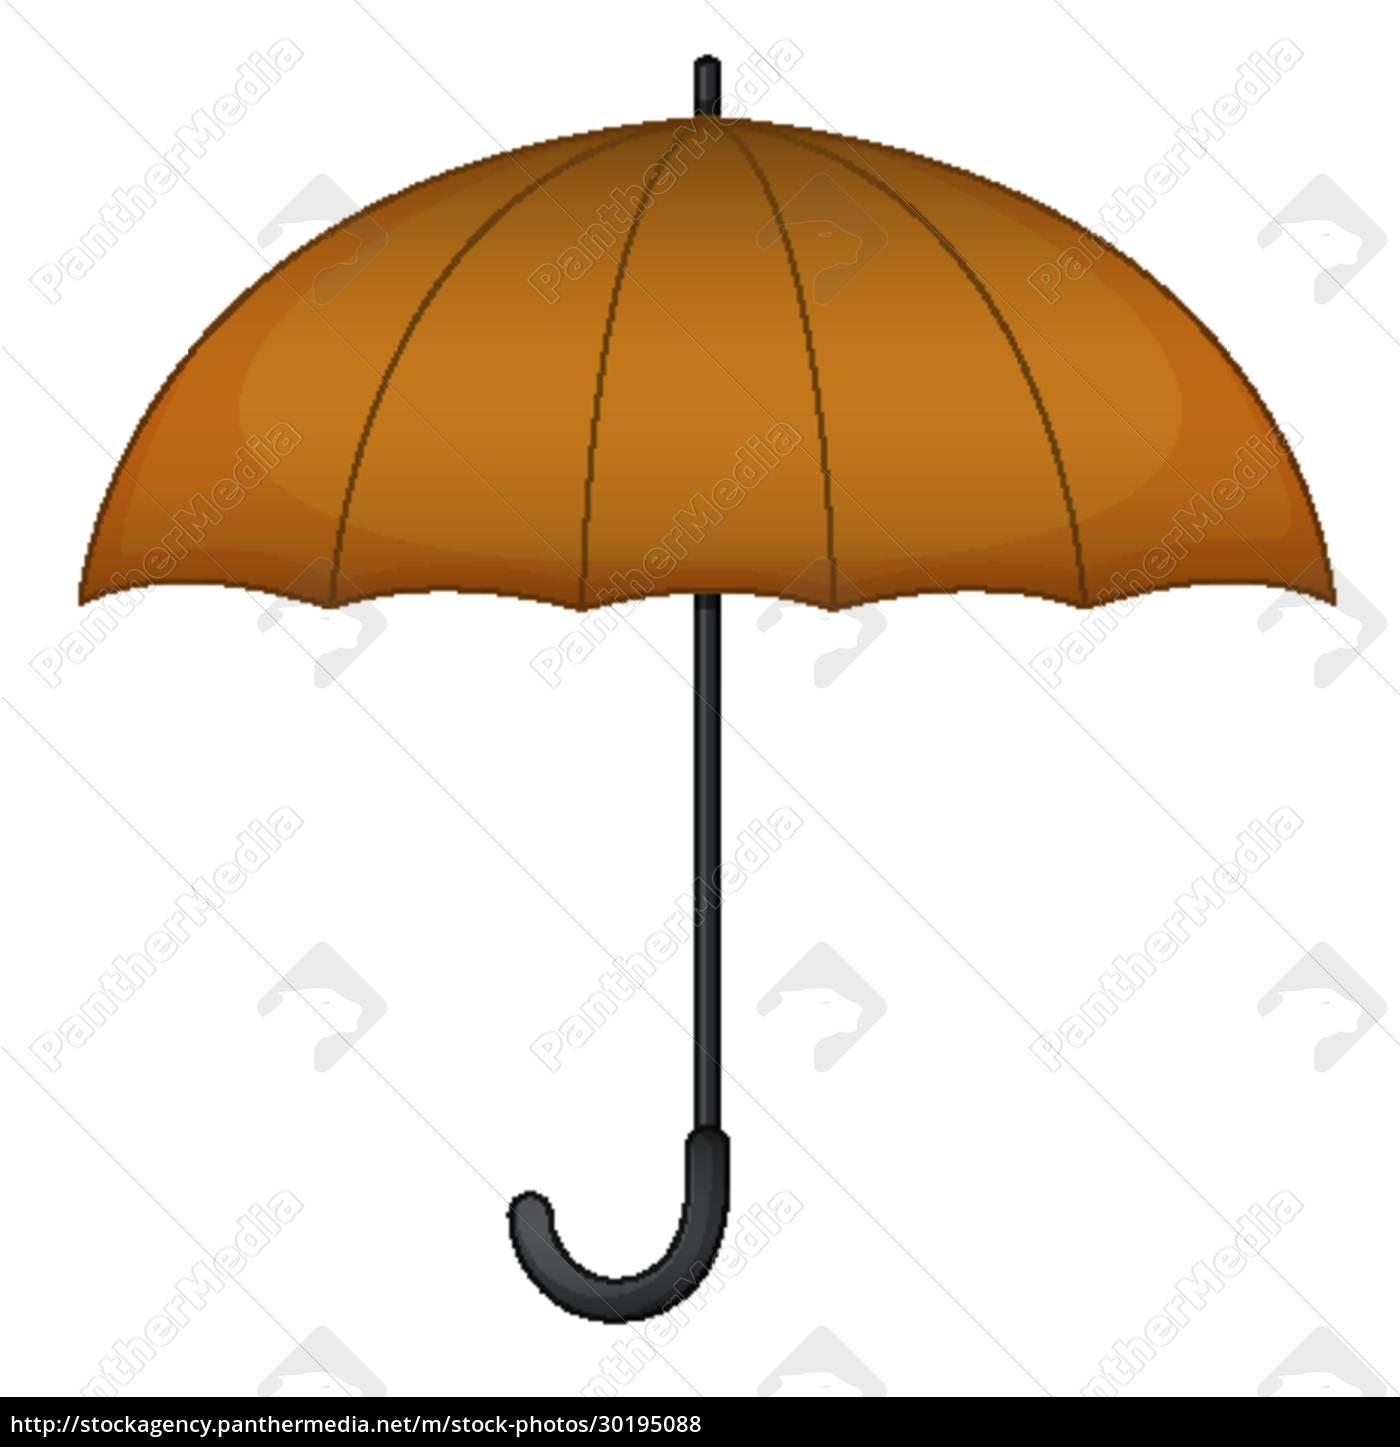 brown, umbrella, with, no, graphic - 30195088